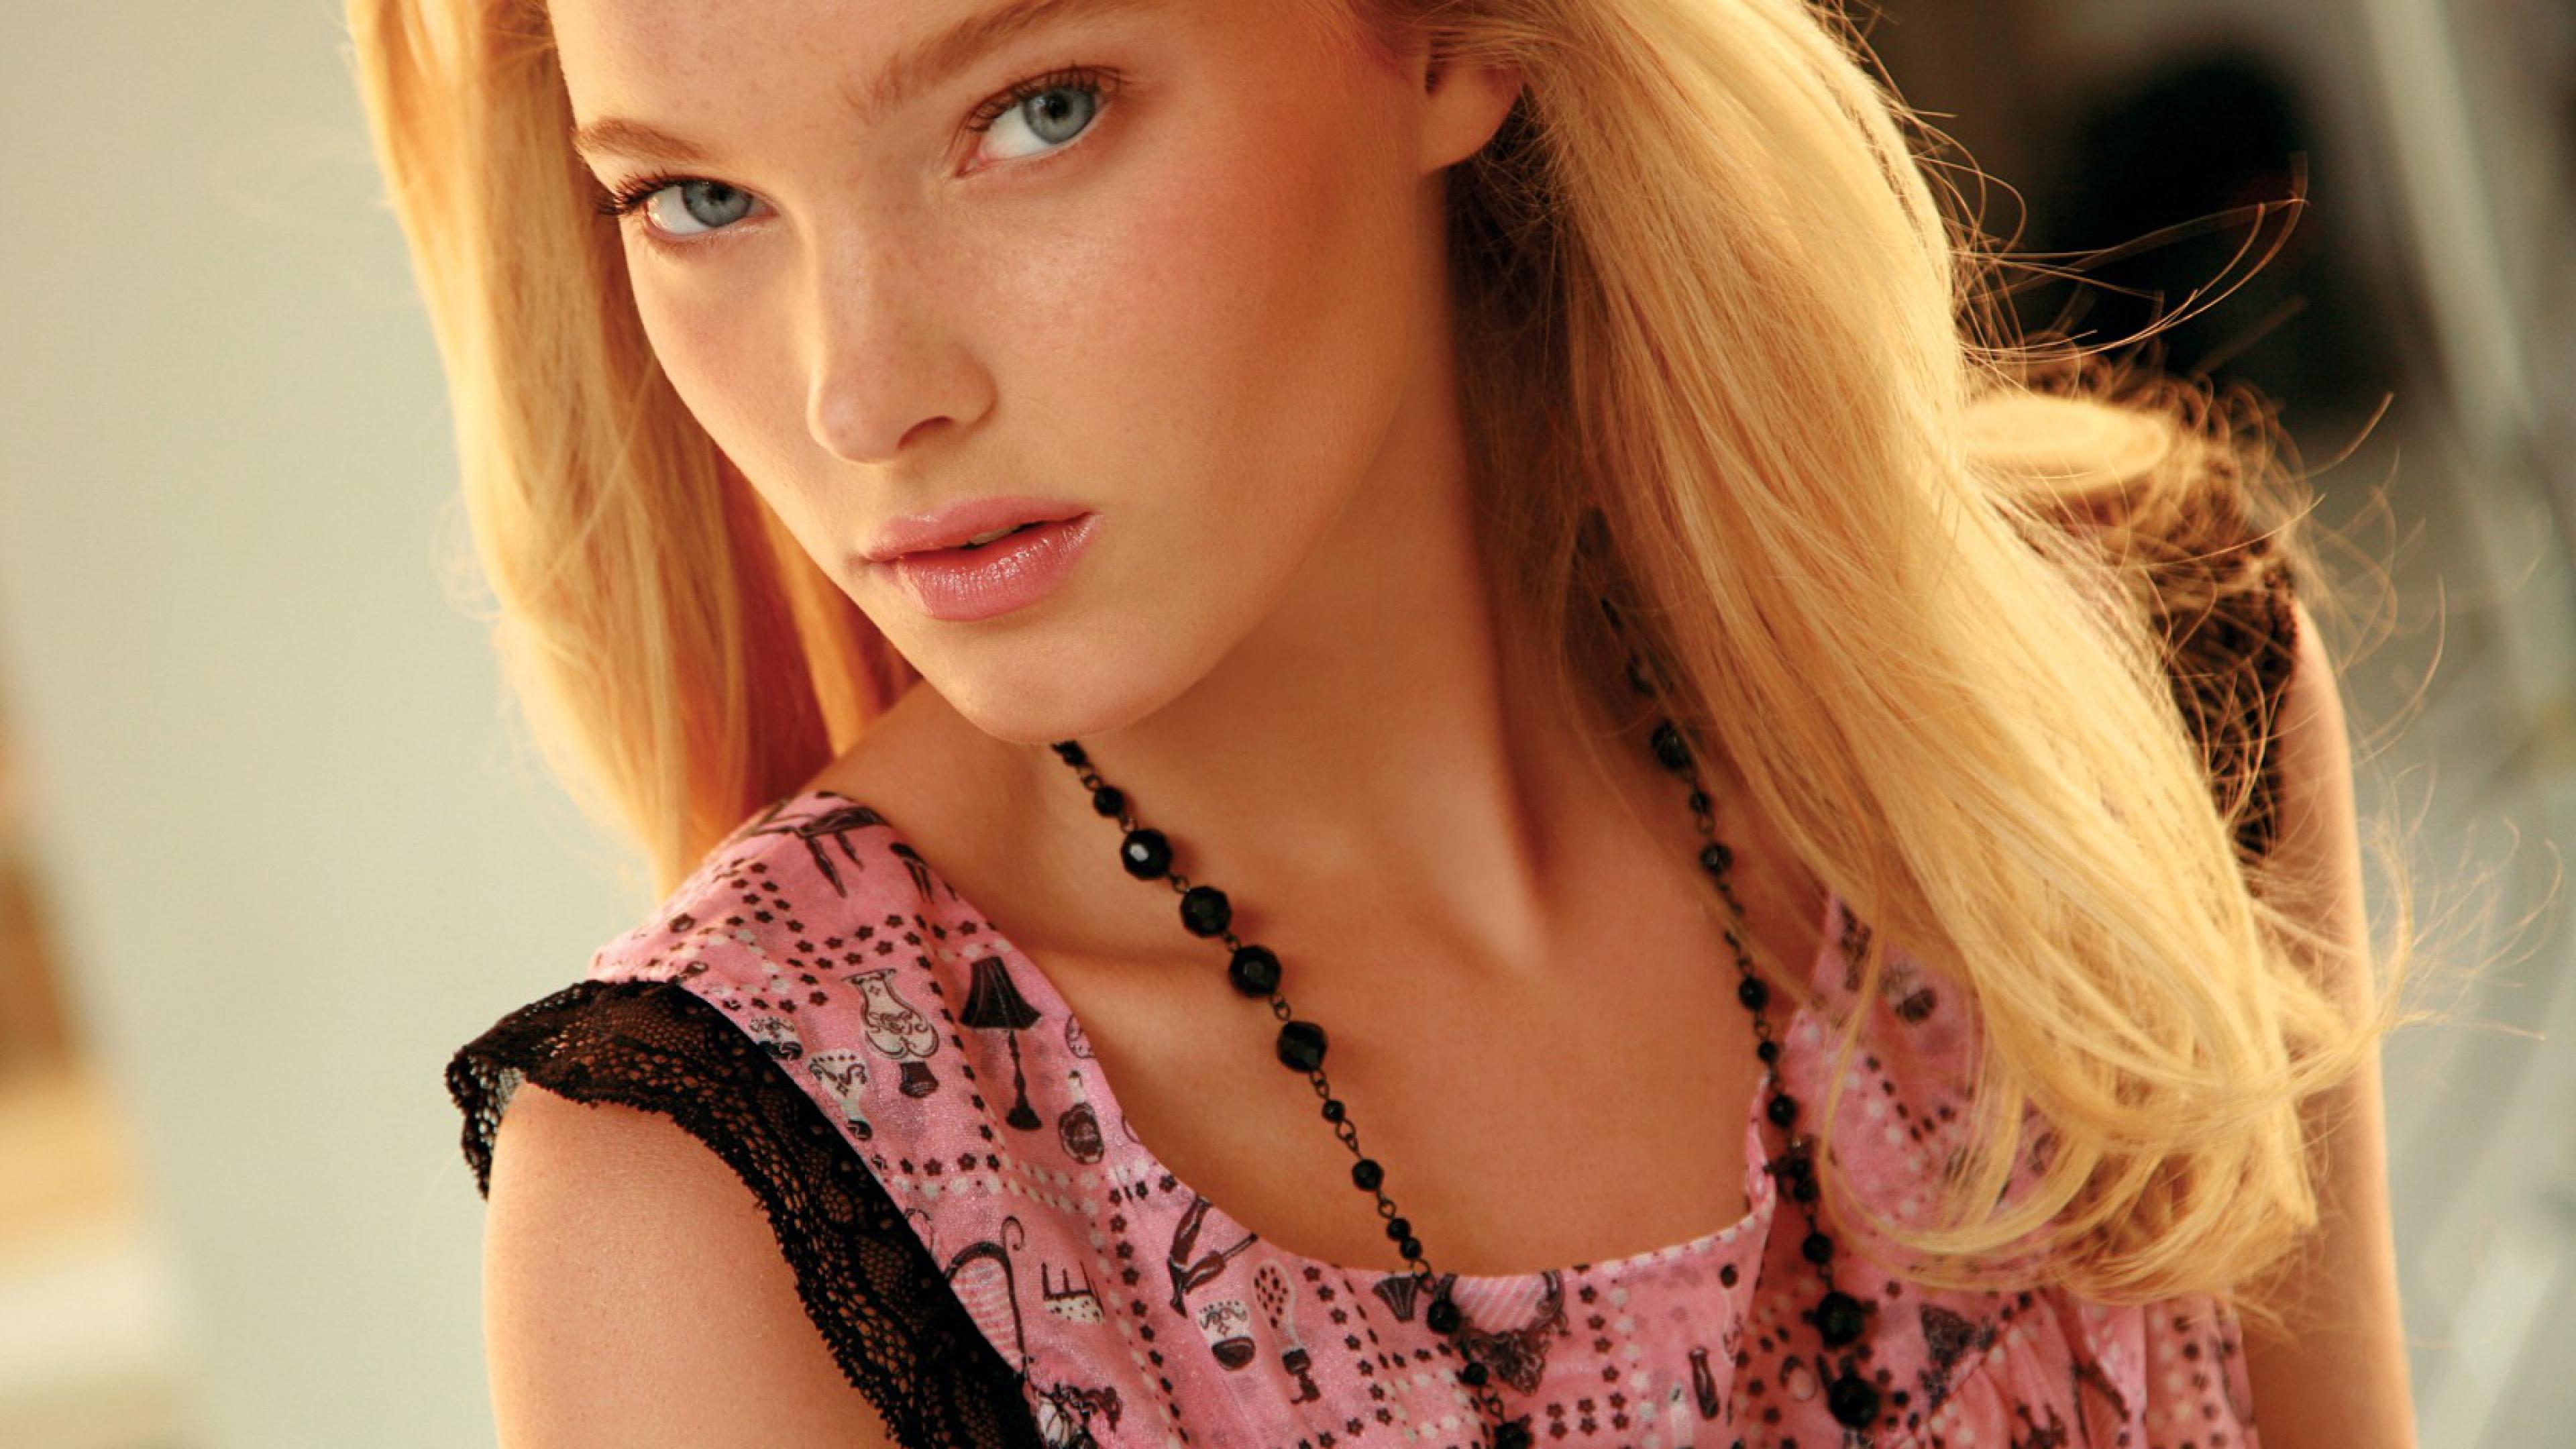 Elsa Hosk Widescreen HD Wallpaper 57105 3840x2160px 3840x2160